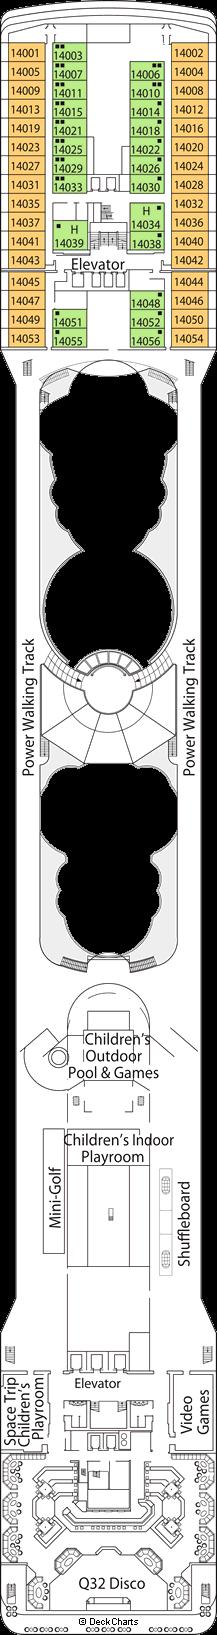 MSC Musica: Capriccio Deck